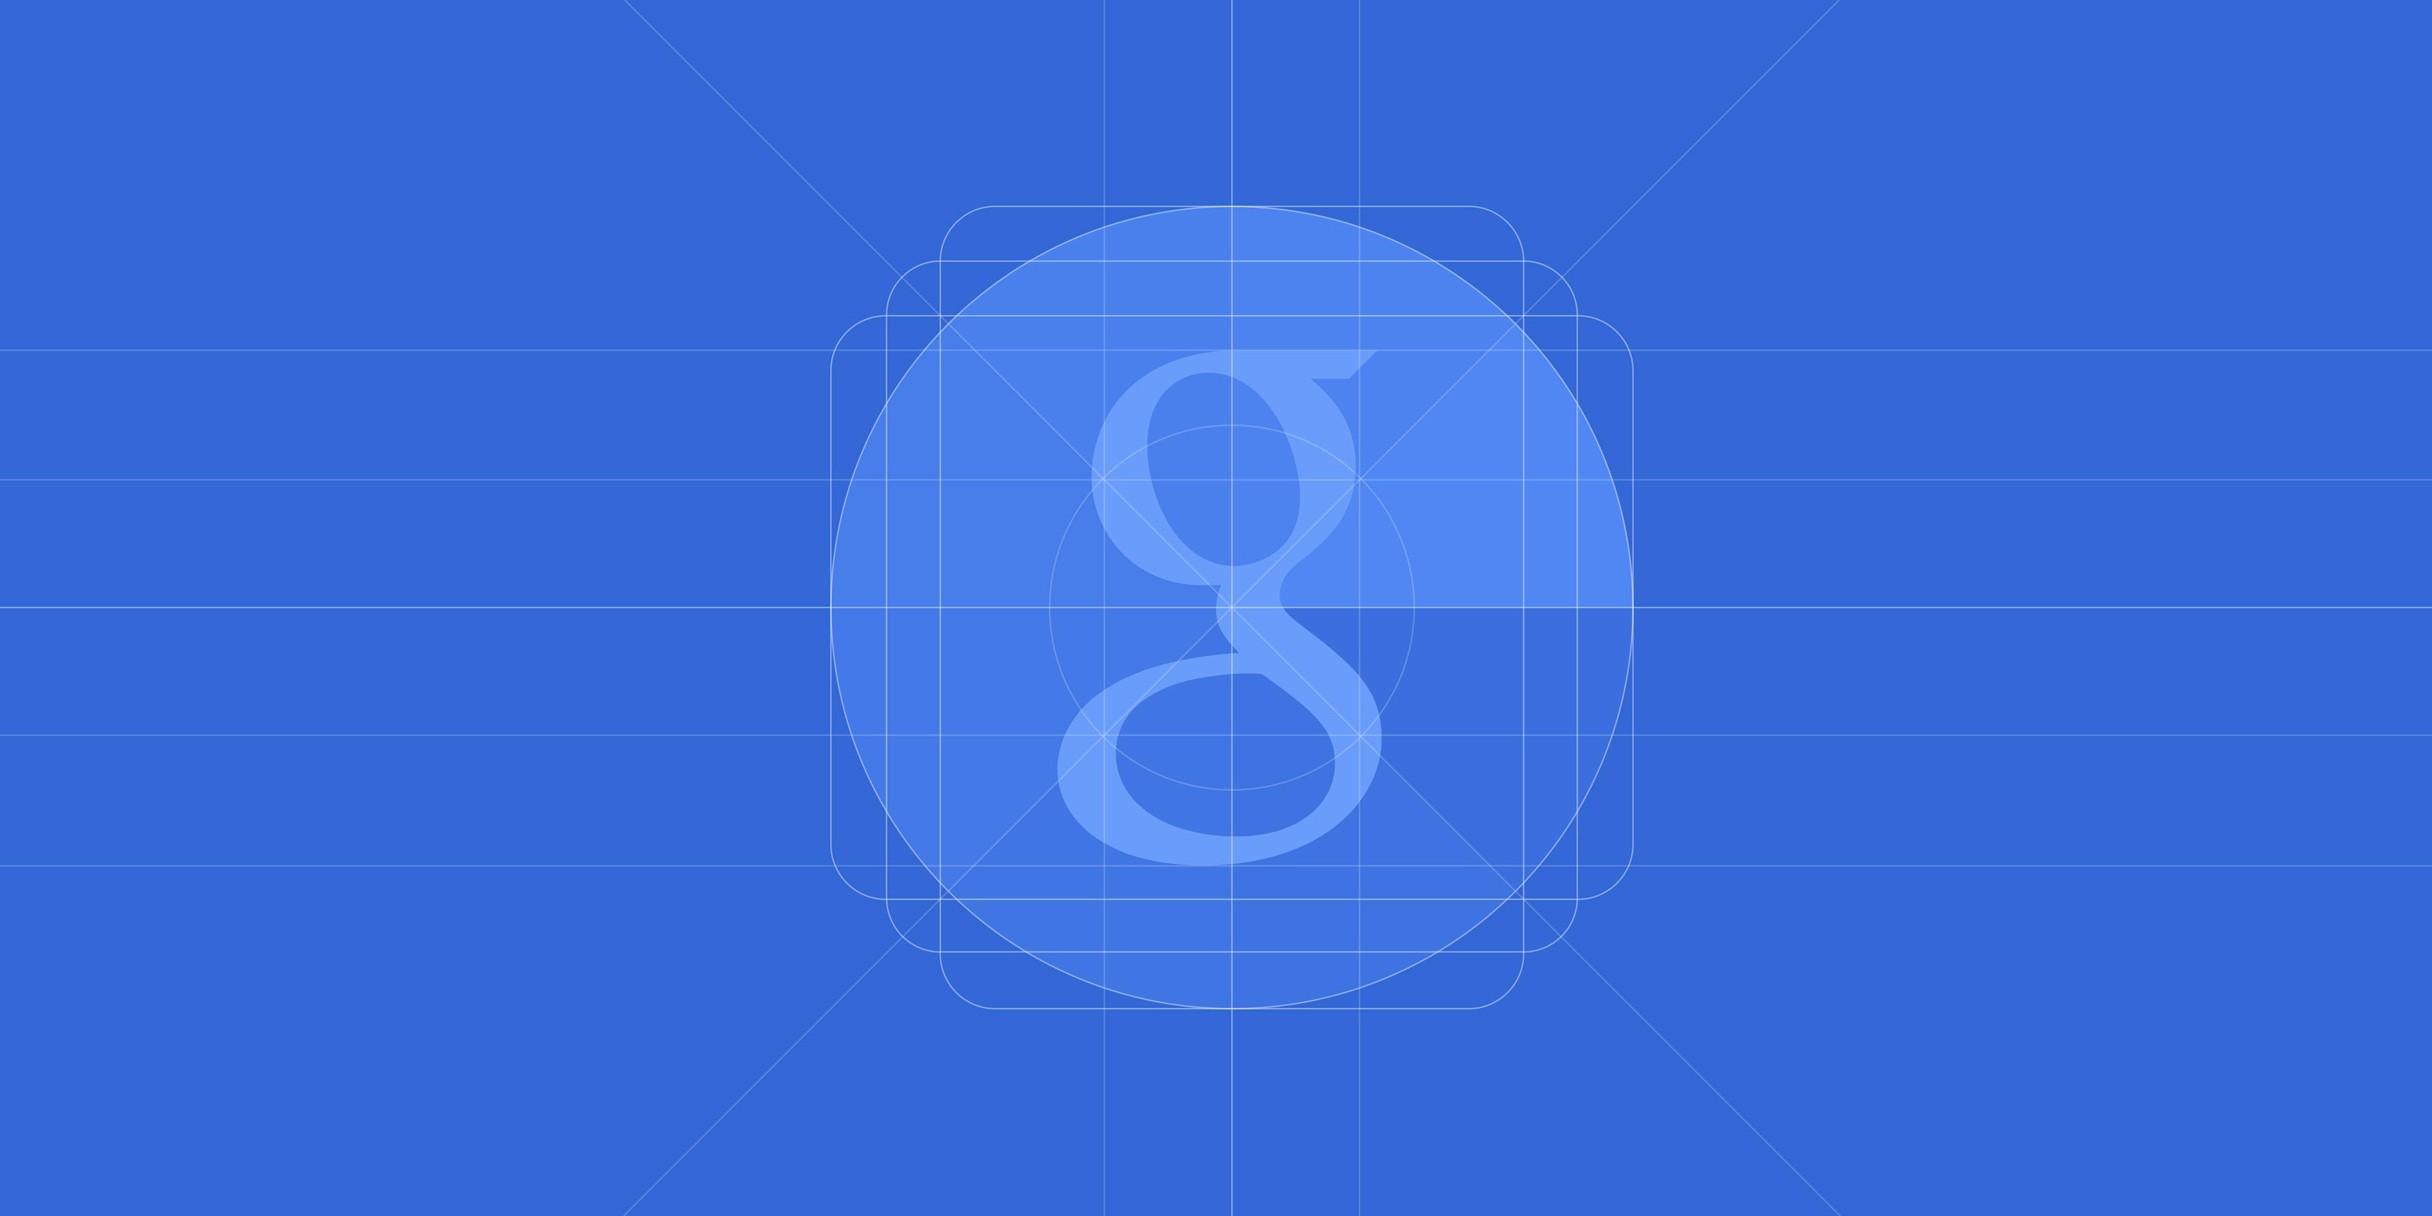 welcome_new_google_design_2x1.jpg